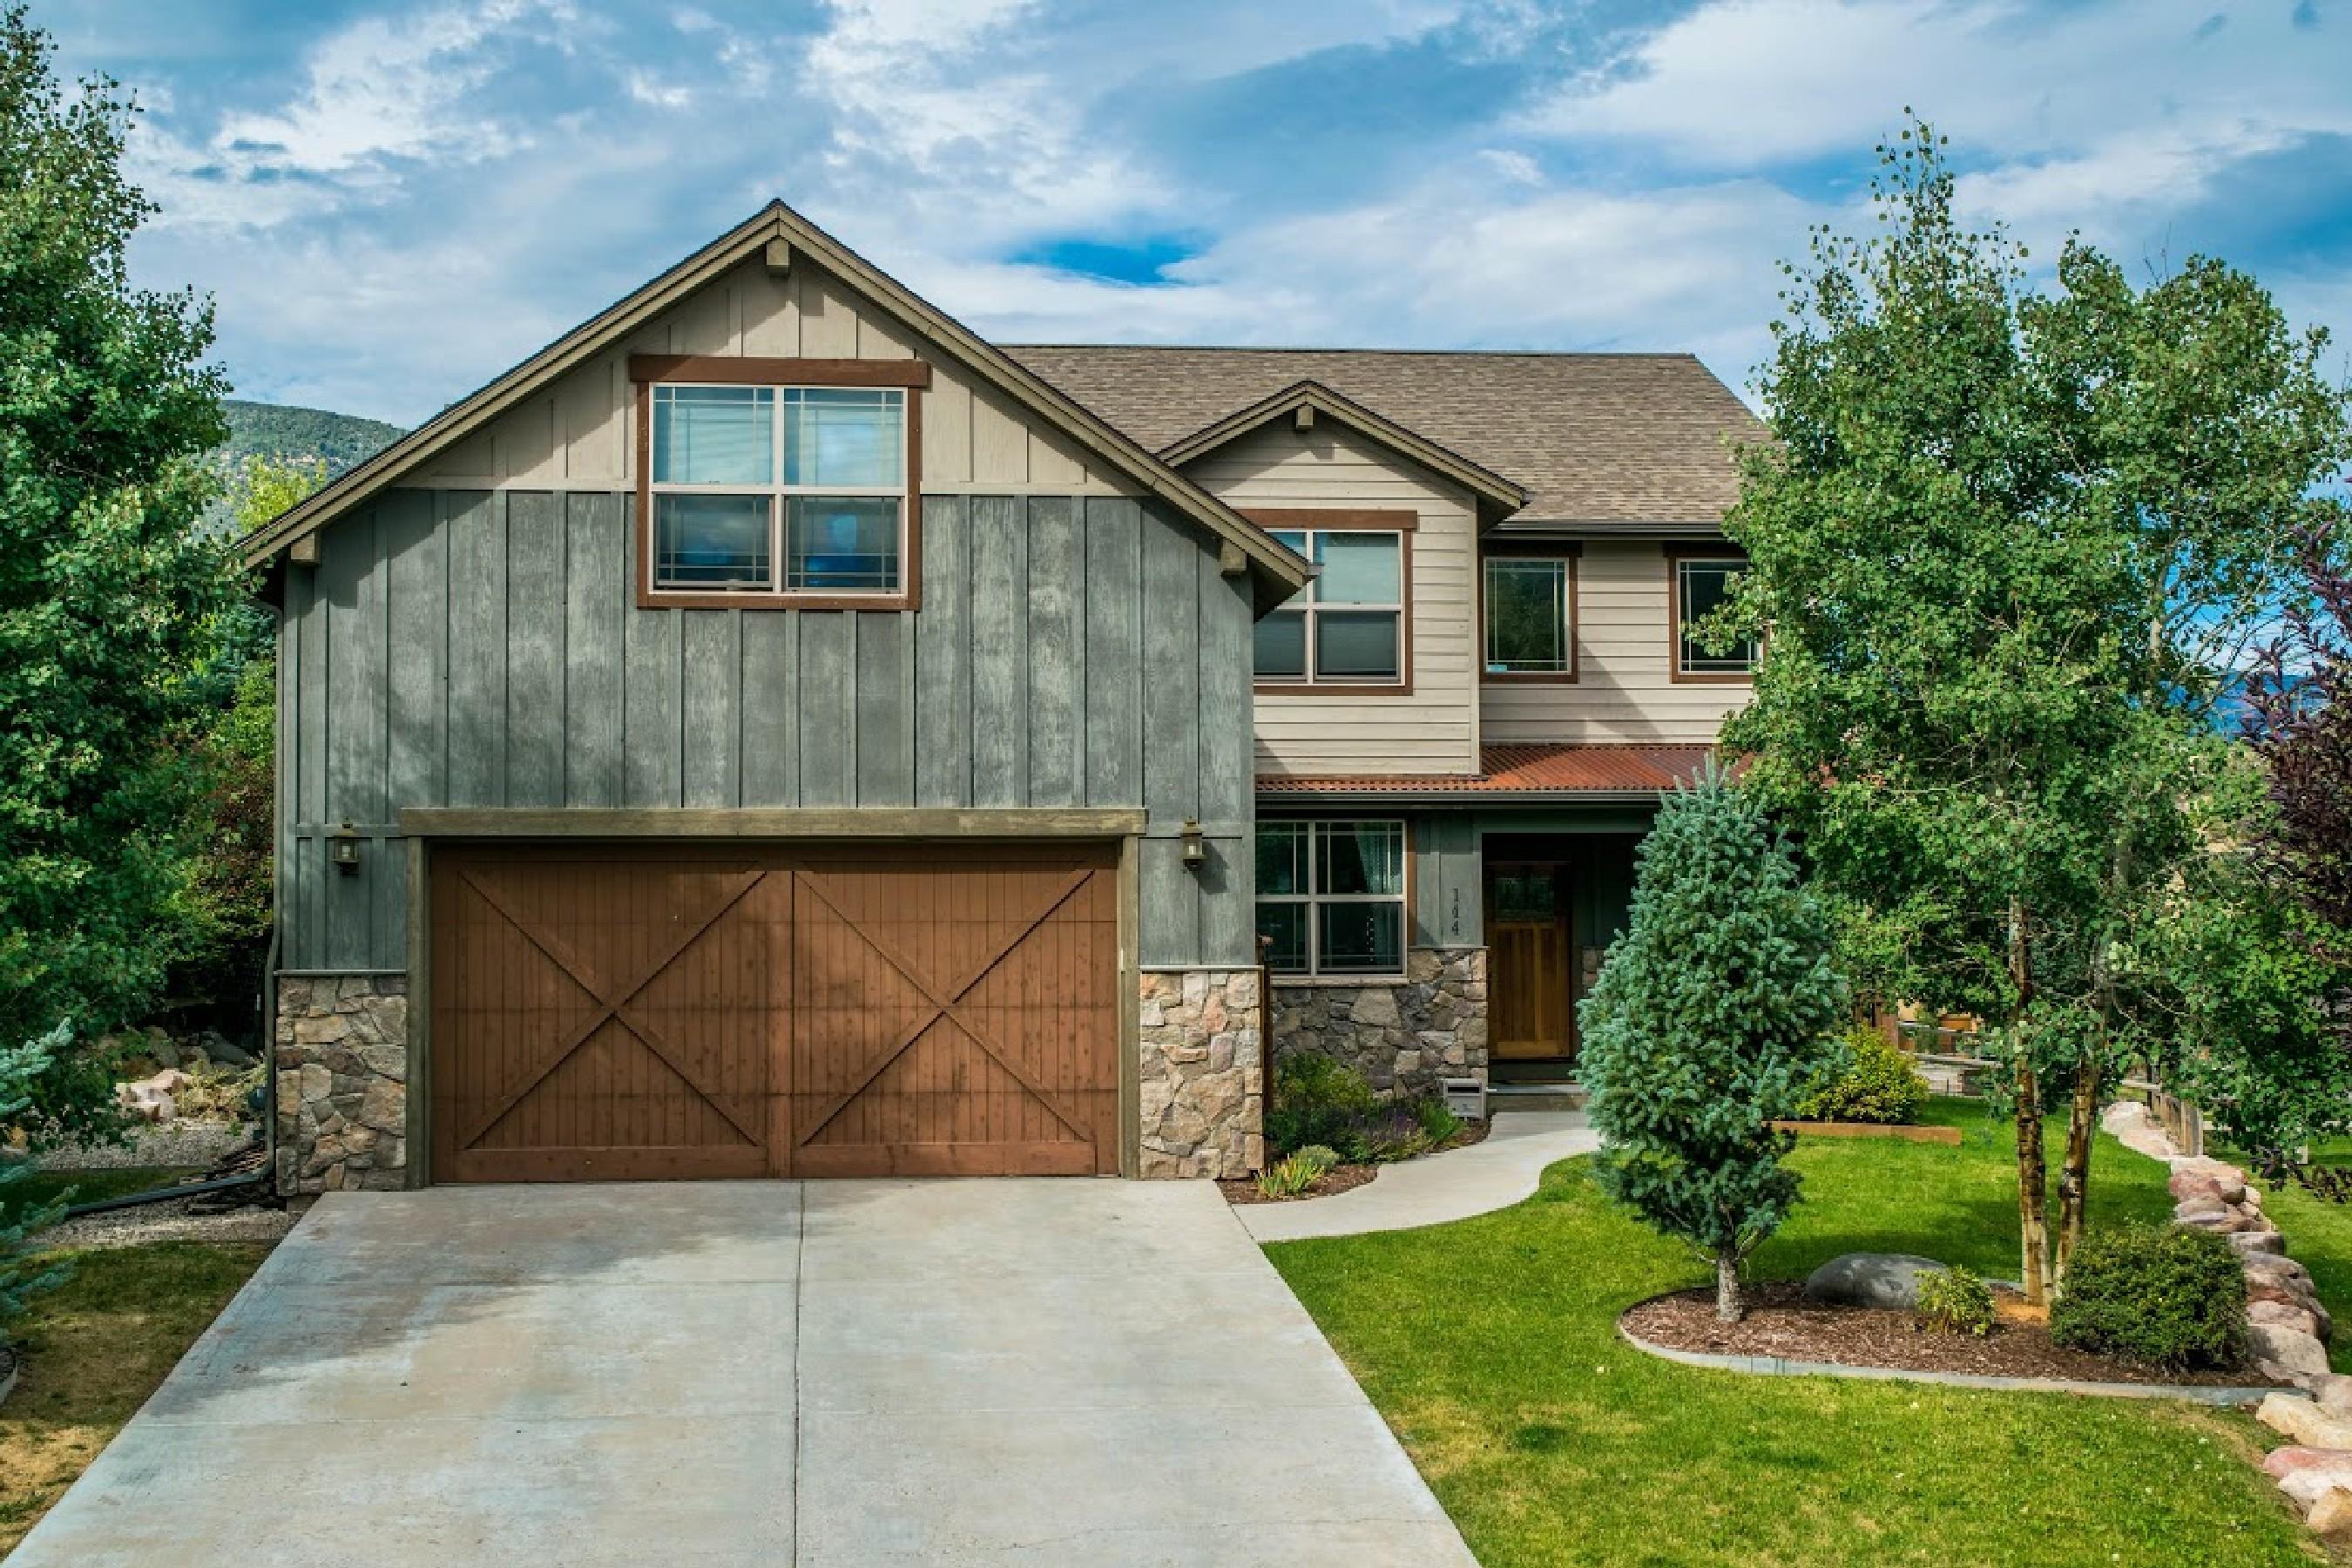 Single Family Home for Sale at Beautiful Home in Lakota 144 Blackhawk Drive New Castle, Colorado, 81647 United States